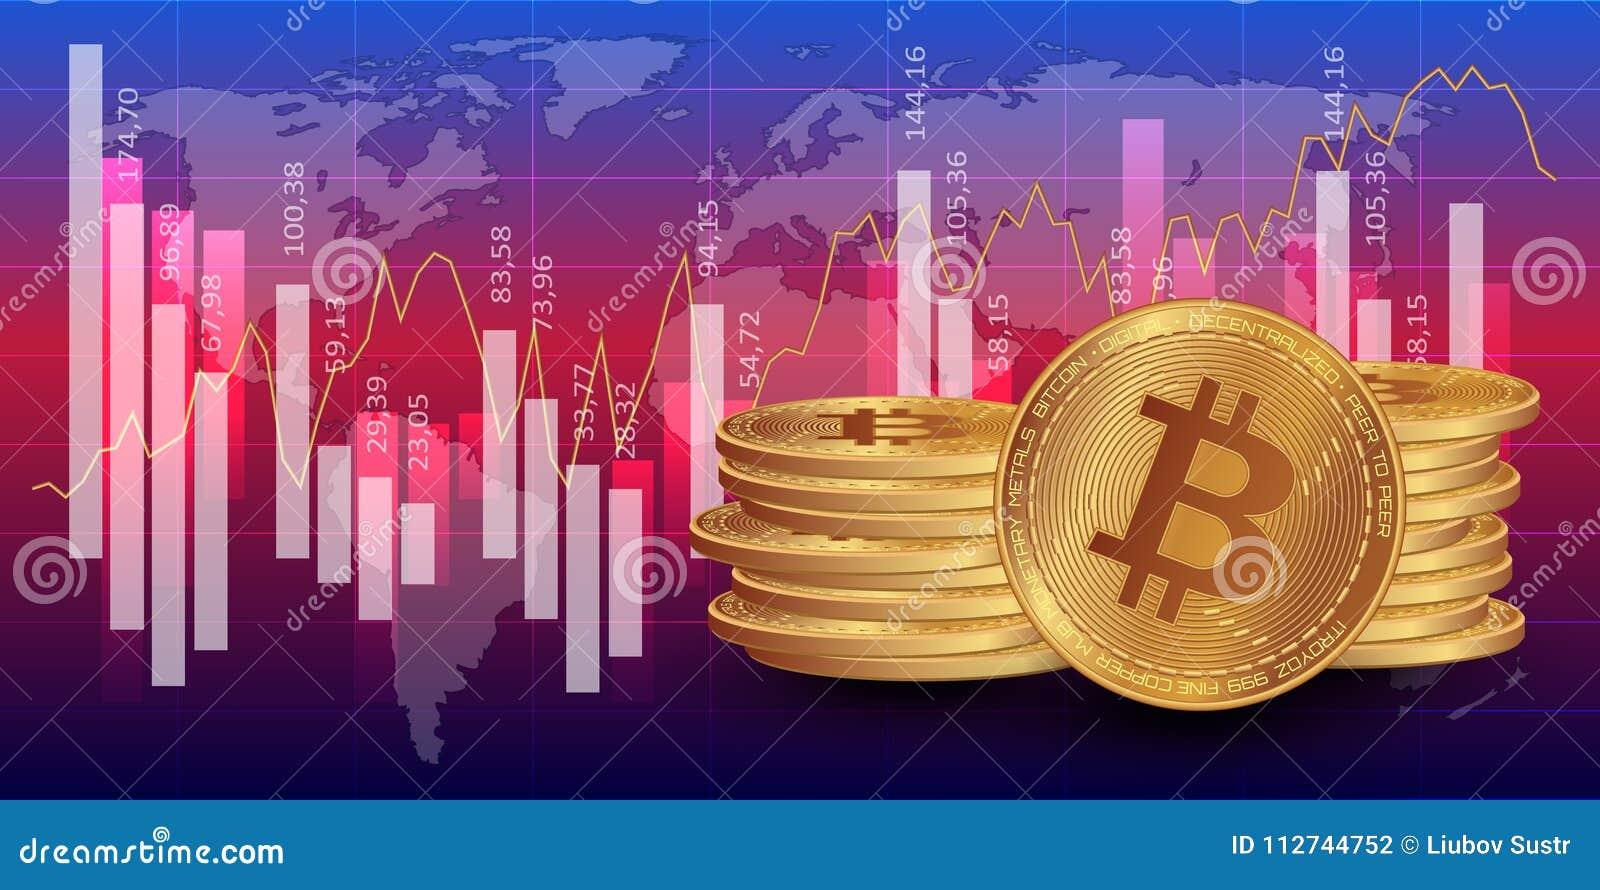 digital currency stocks